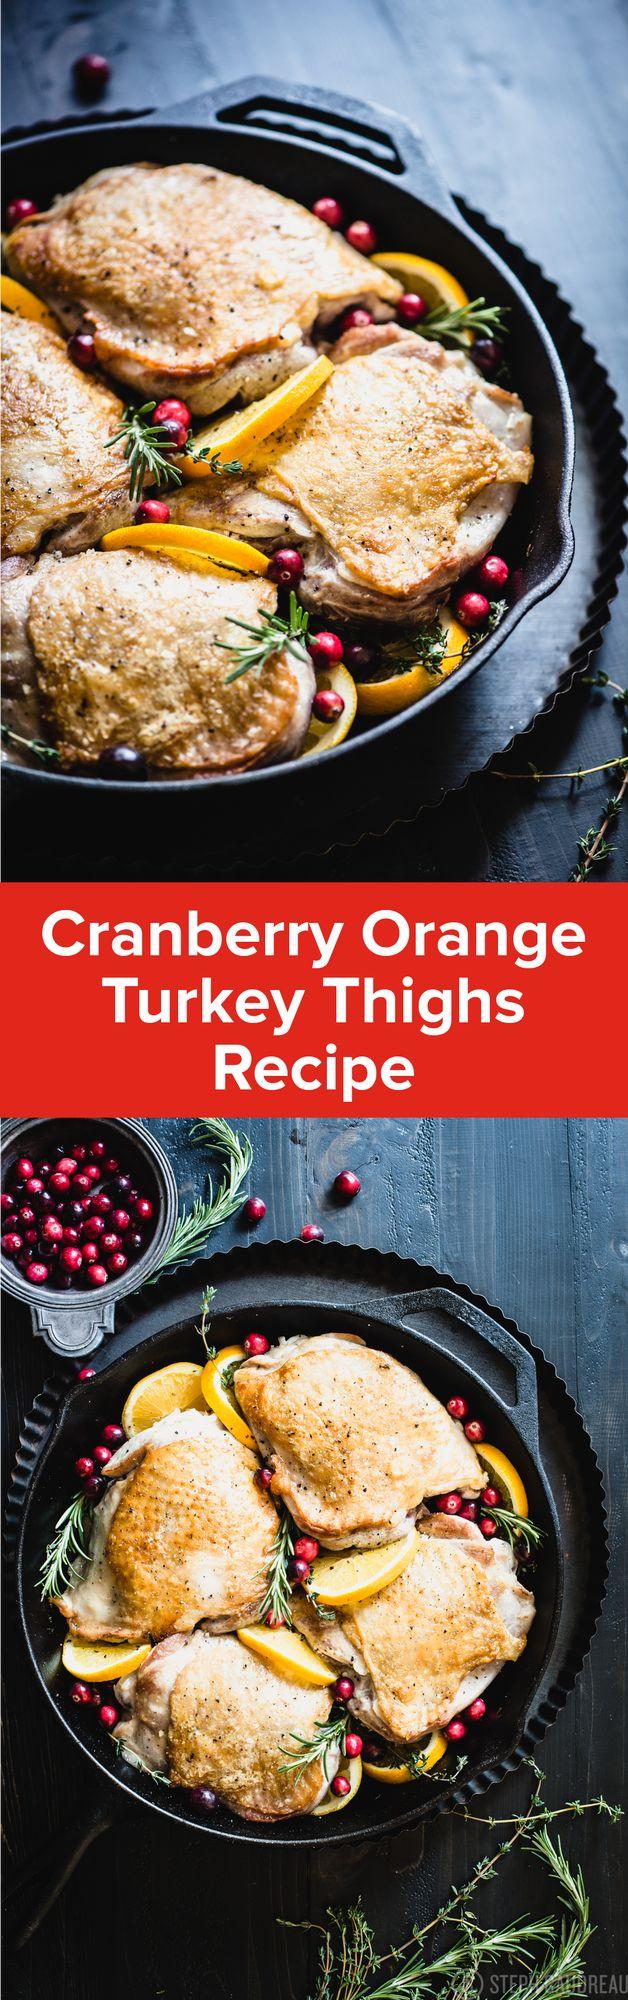 Cranberry Orange Turkey Thighs Recipe   Stupid Easy Paleo   Bloglovin'